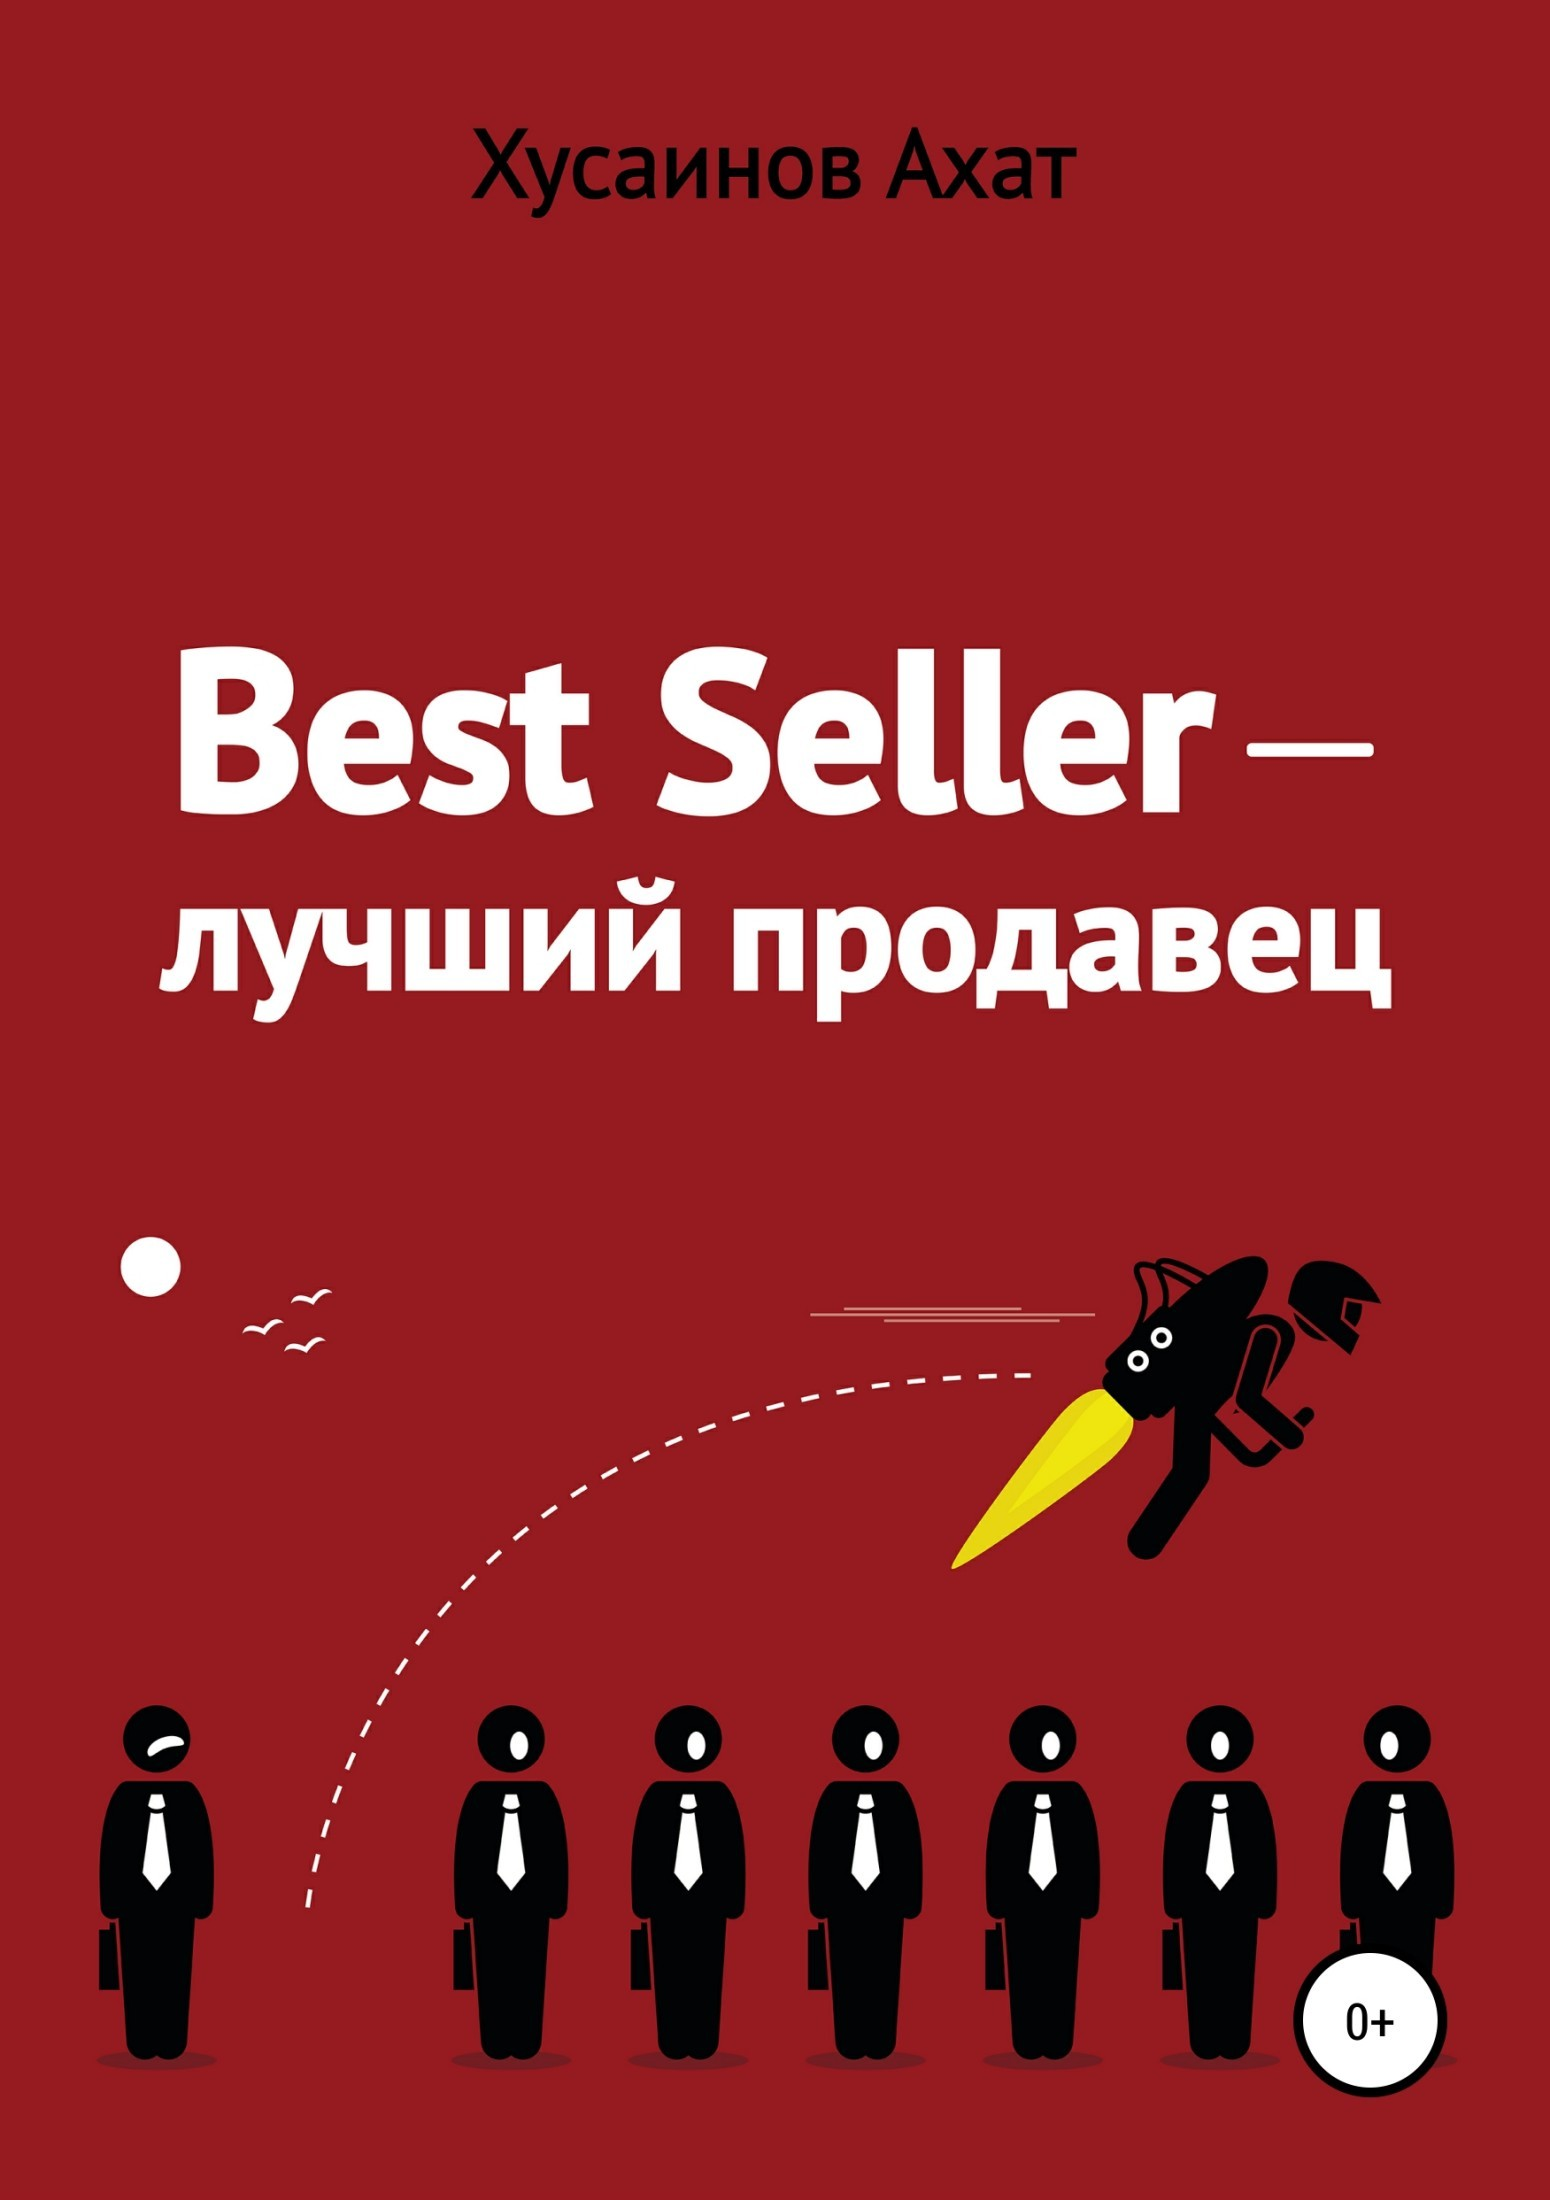 Best Seller. Лучший продавец